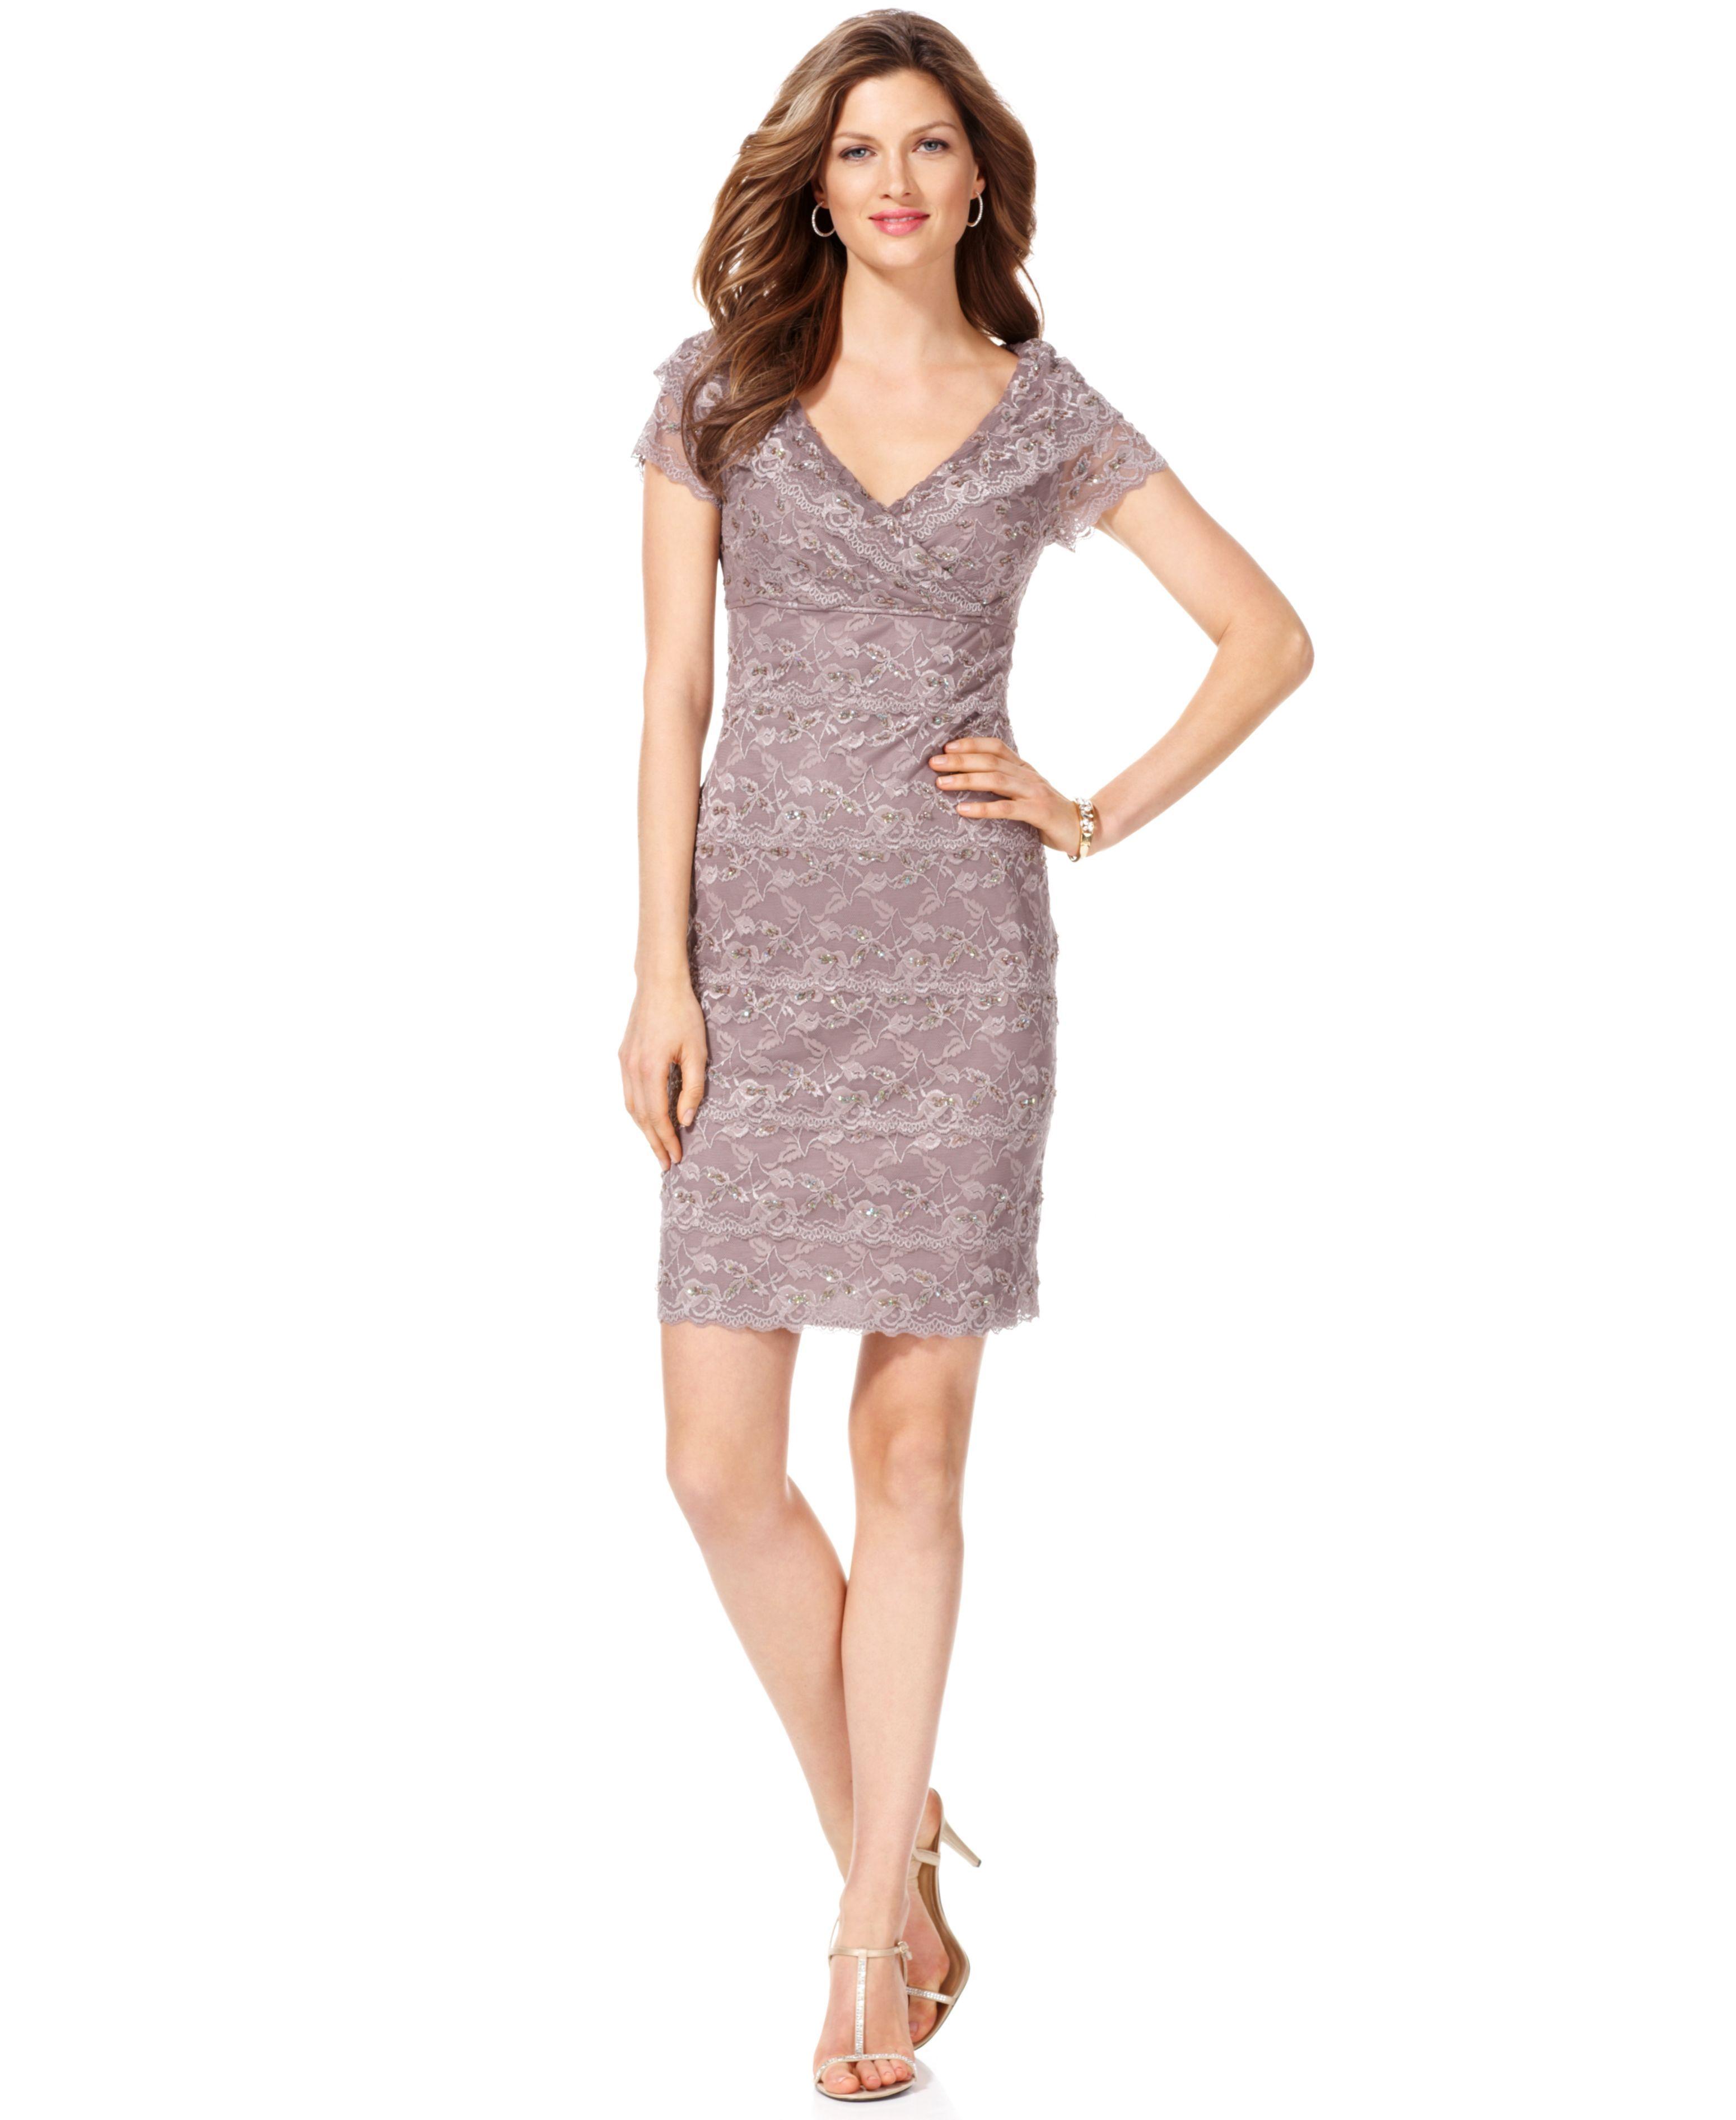 e89bf2f3614 Womens Cocktail Dresses At Macys - Data Dynamic AG